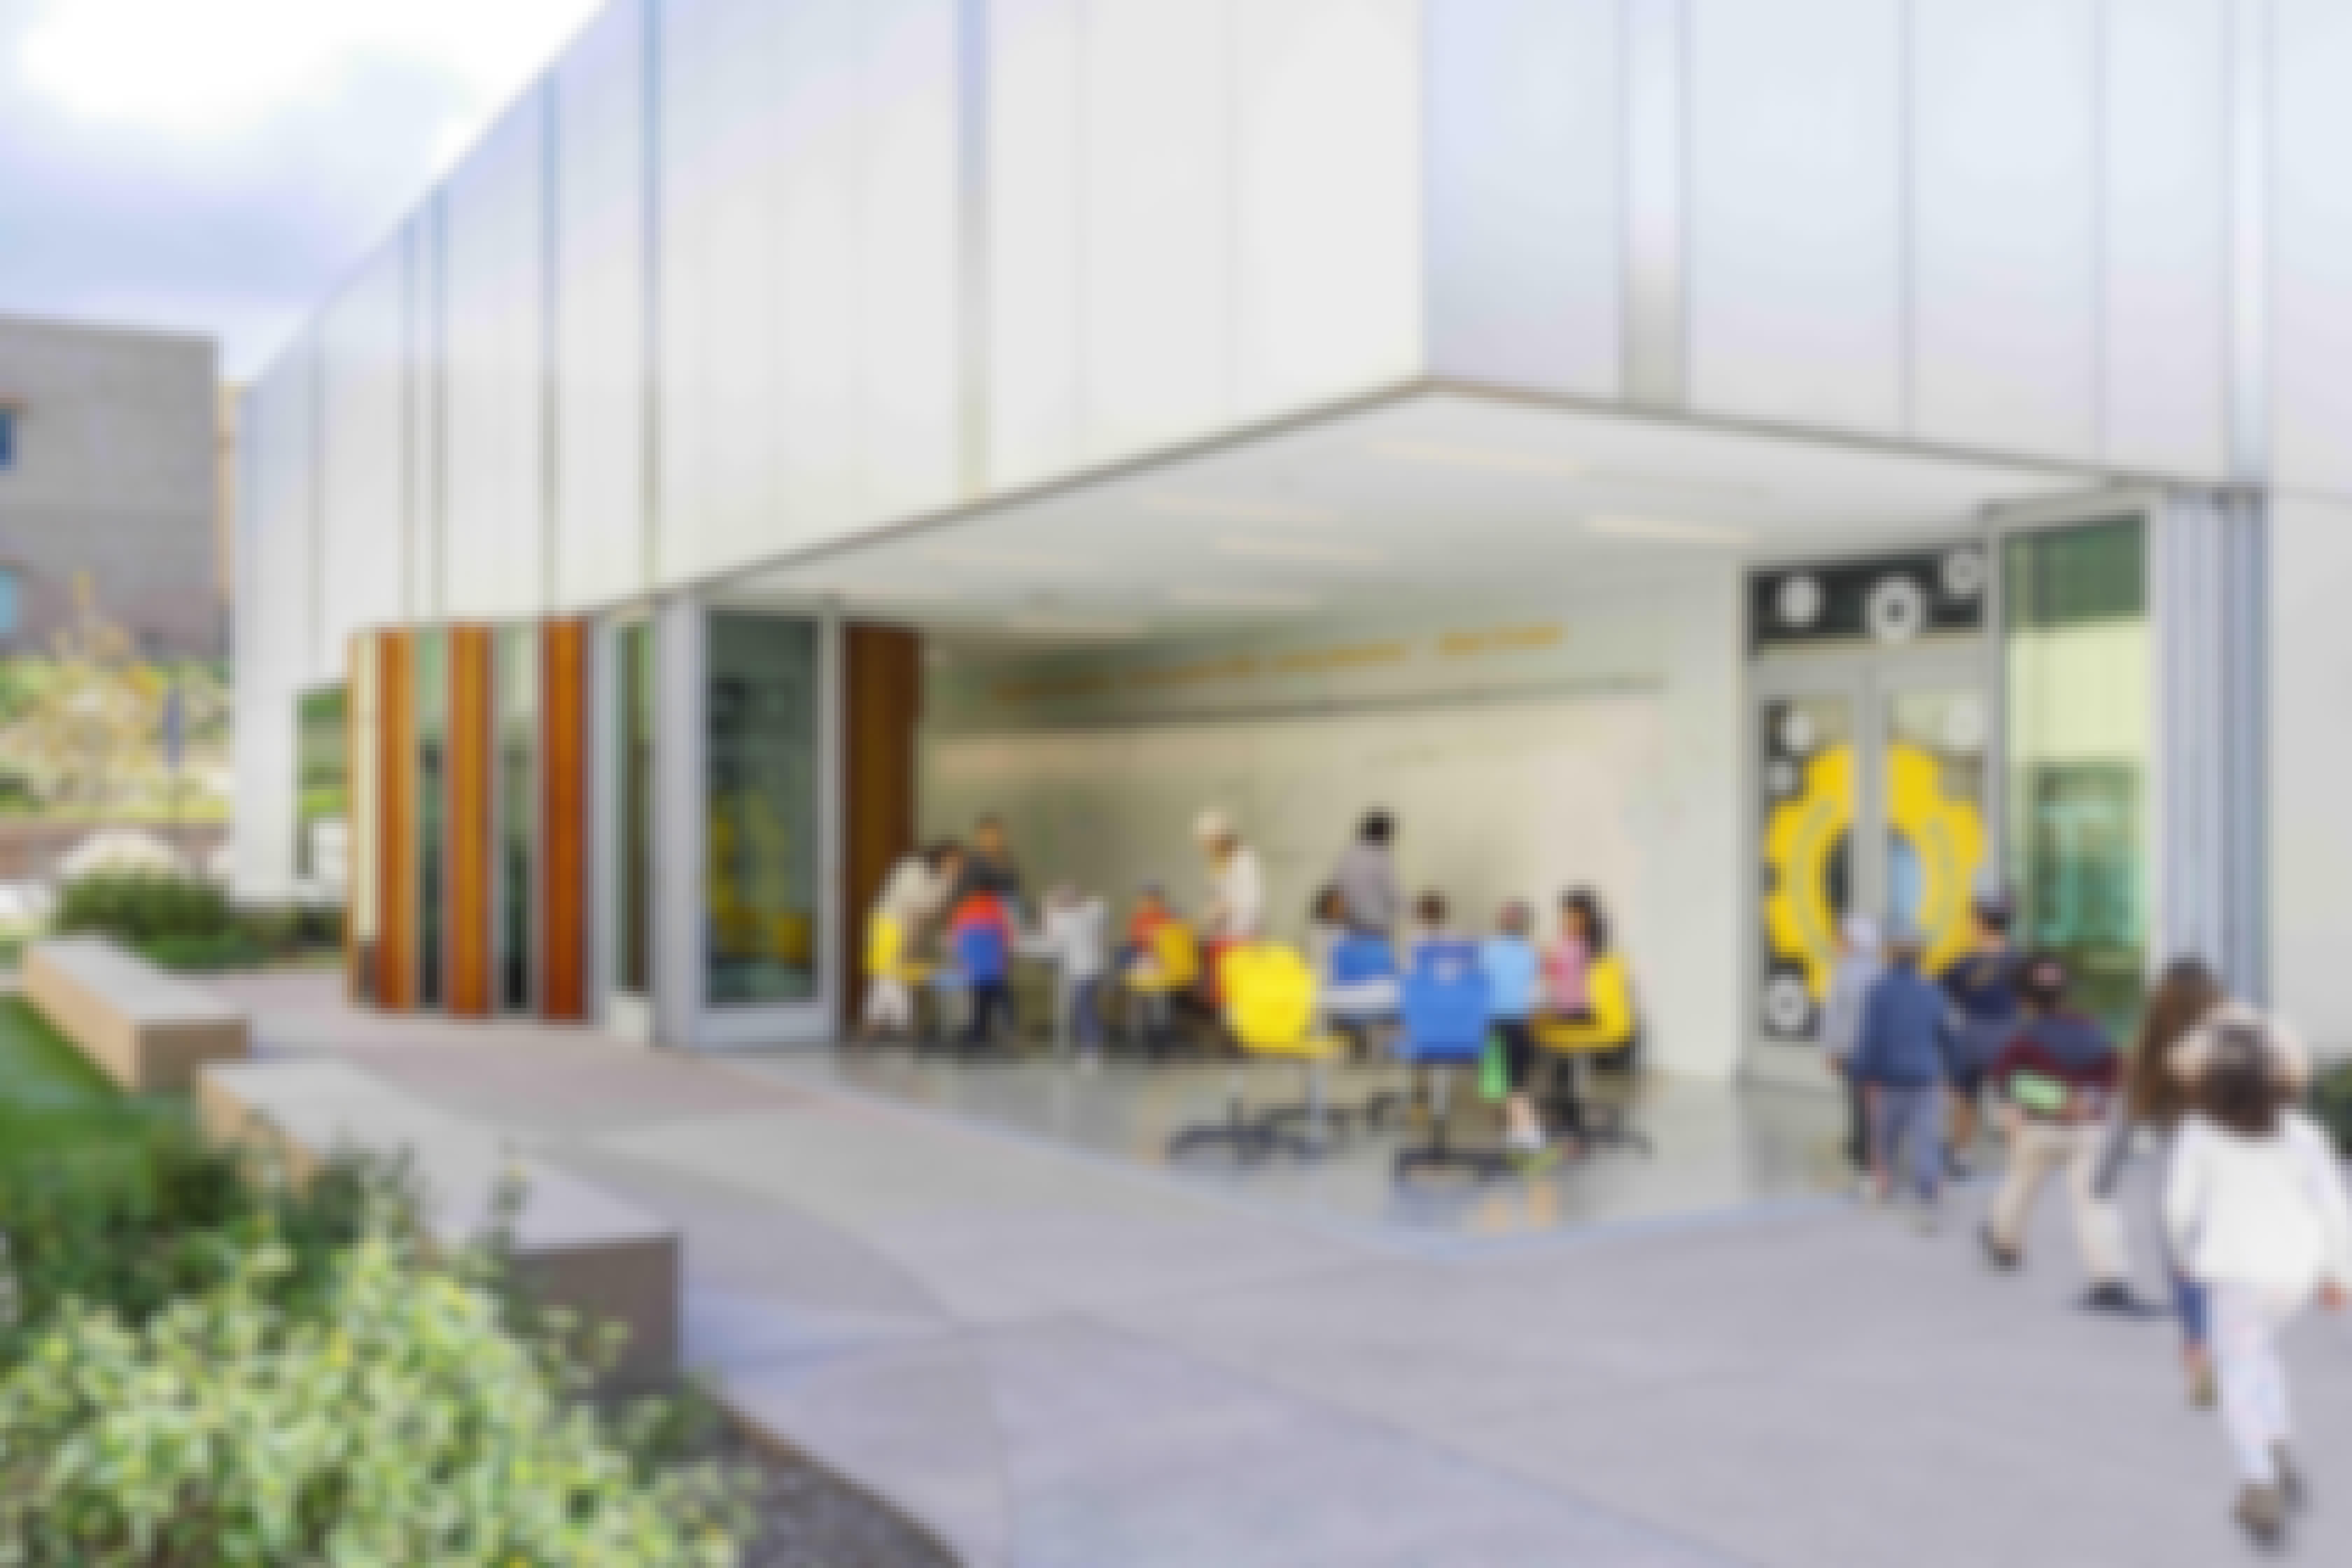 open-corner-sliding-glass-wall-in-outside-classroom